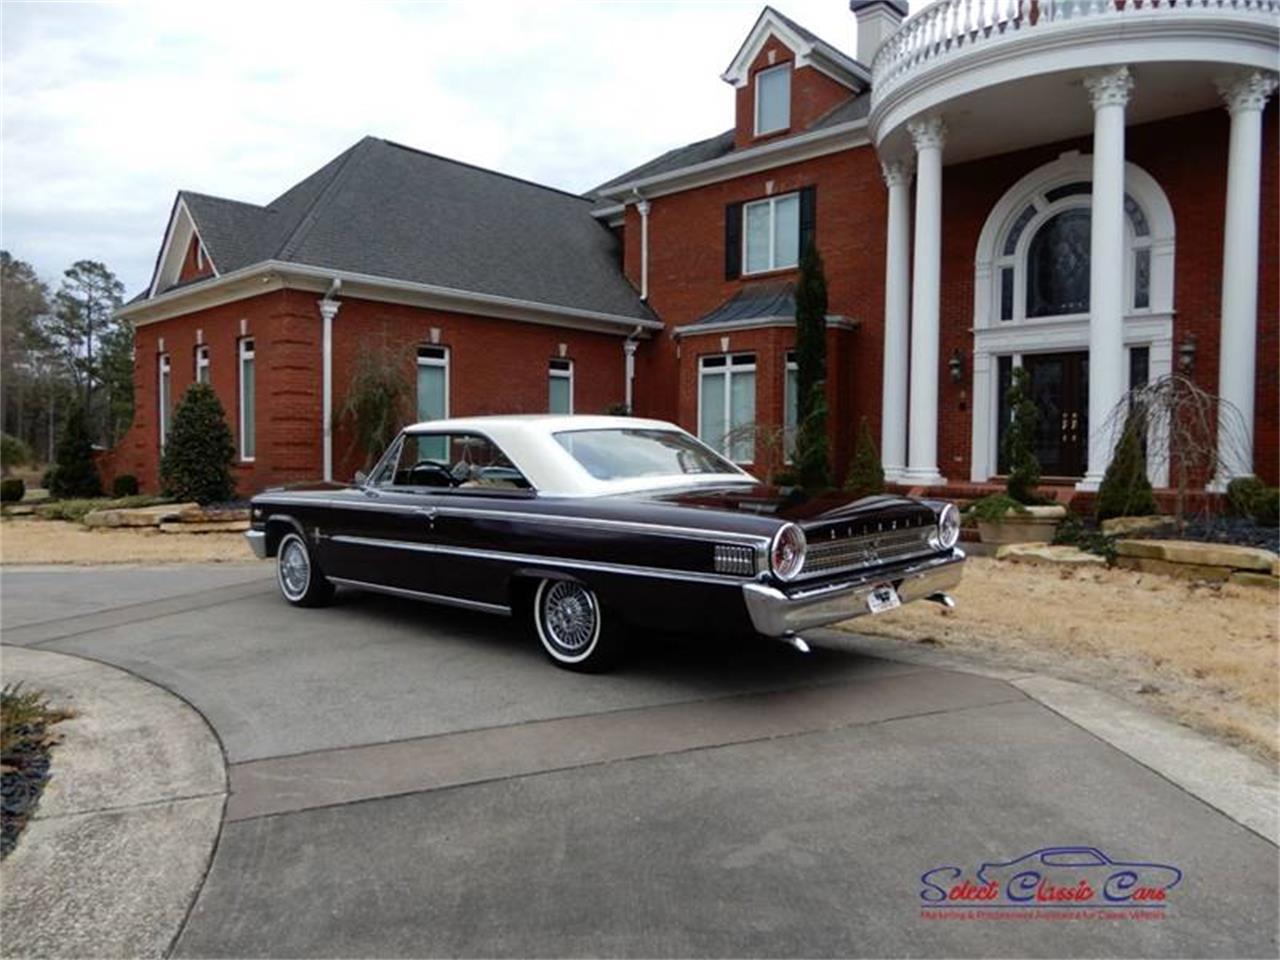 1963 Ford Galaxie 500 for sale in Hiram, GA / ClassicCarsBay com